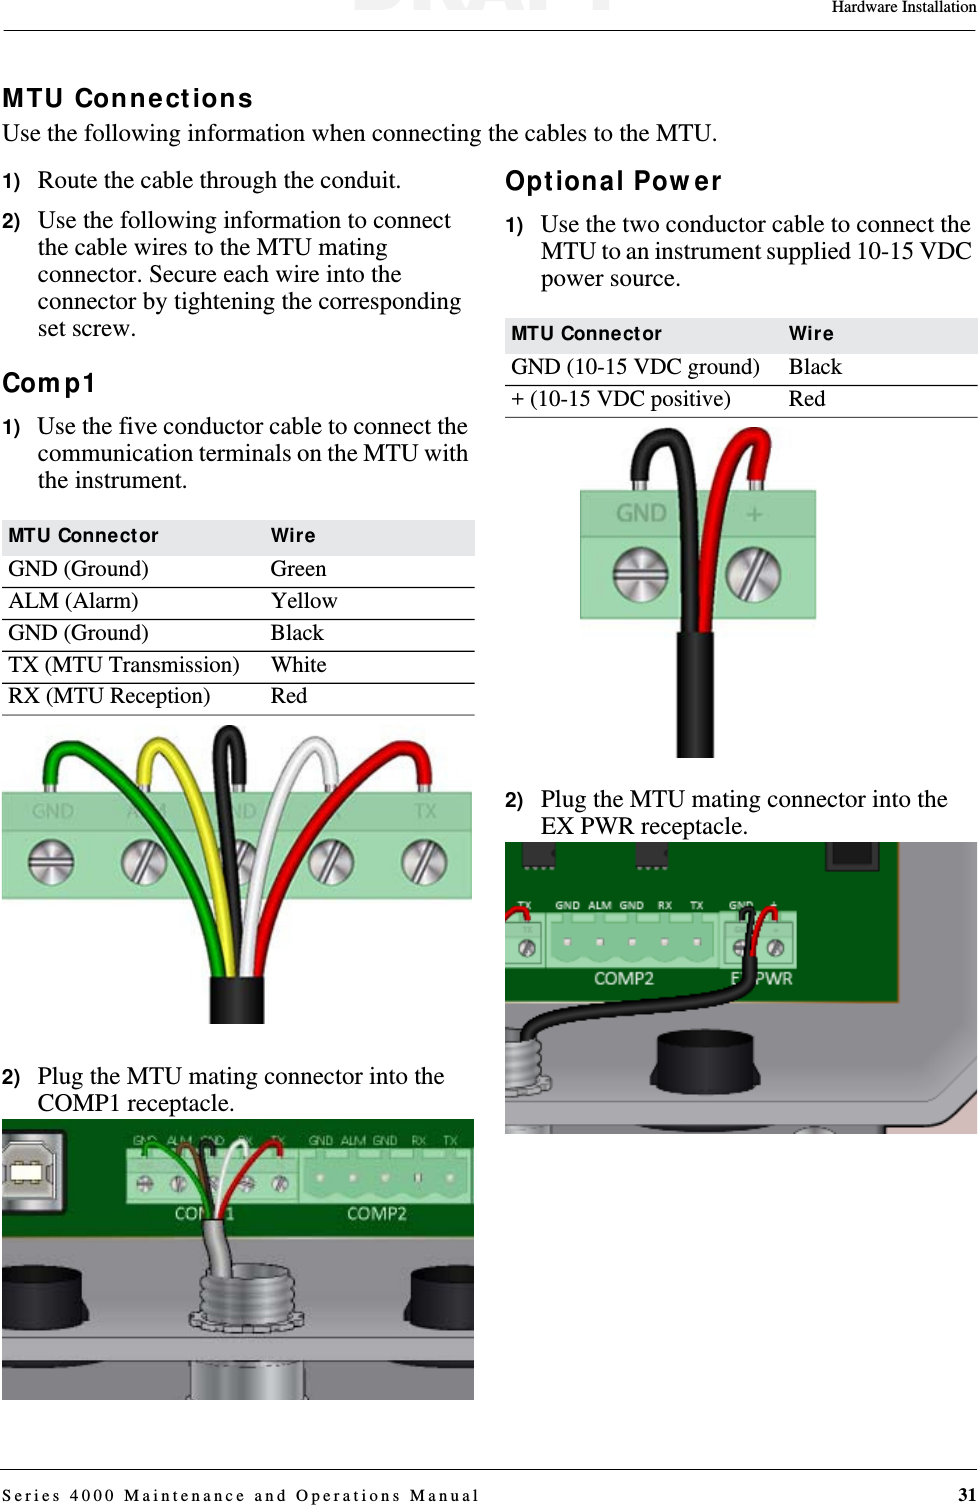 Aclara Technologies 2015001 Series 4000 MTU User Manual